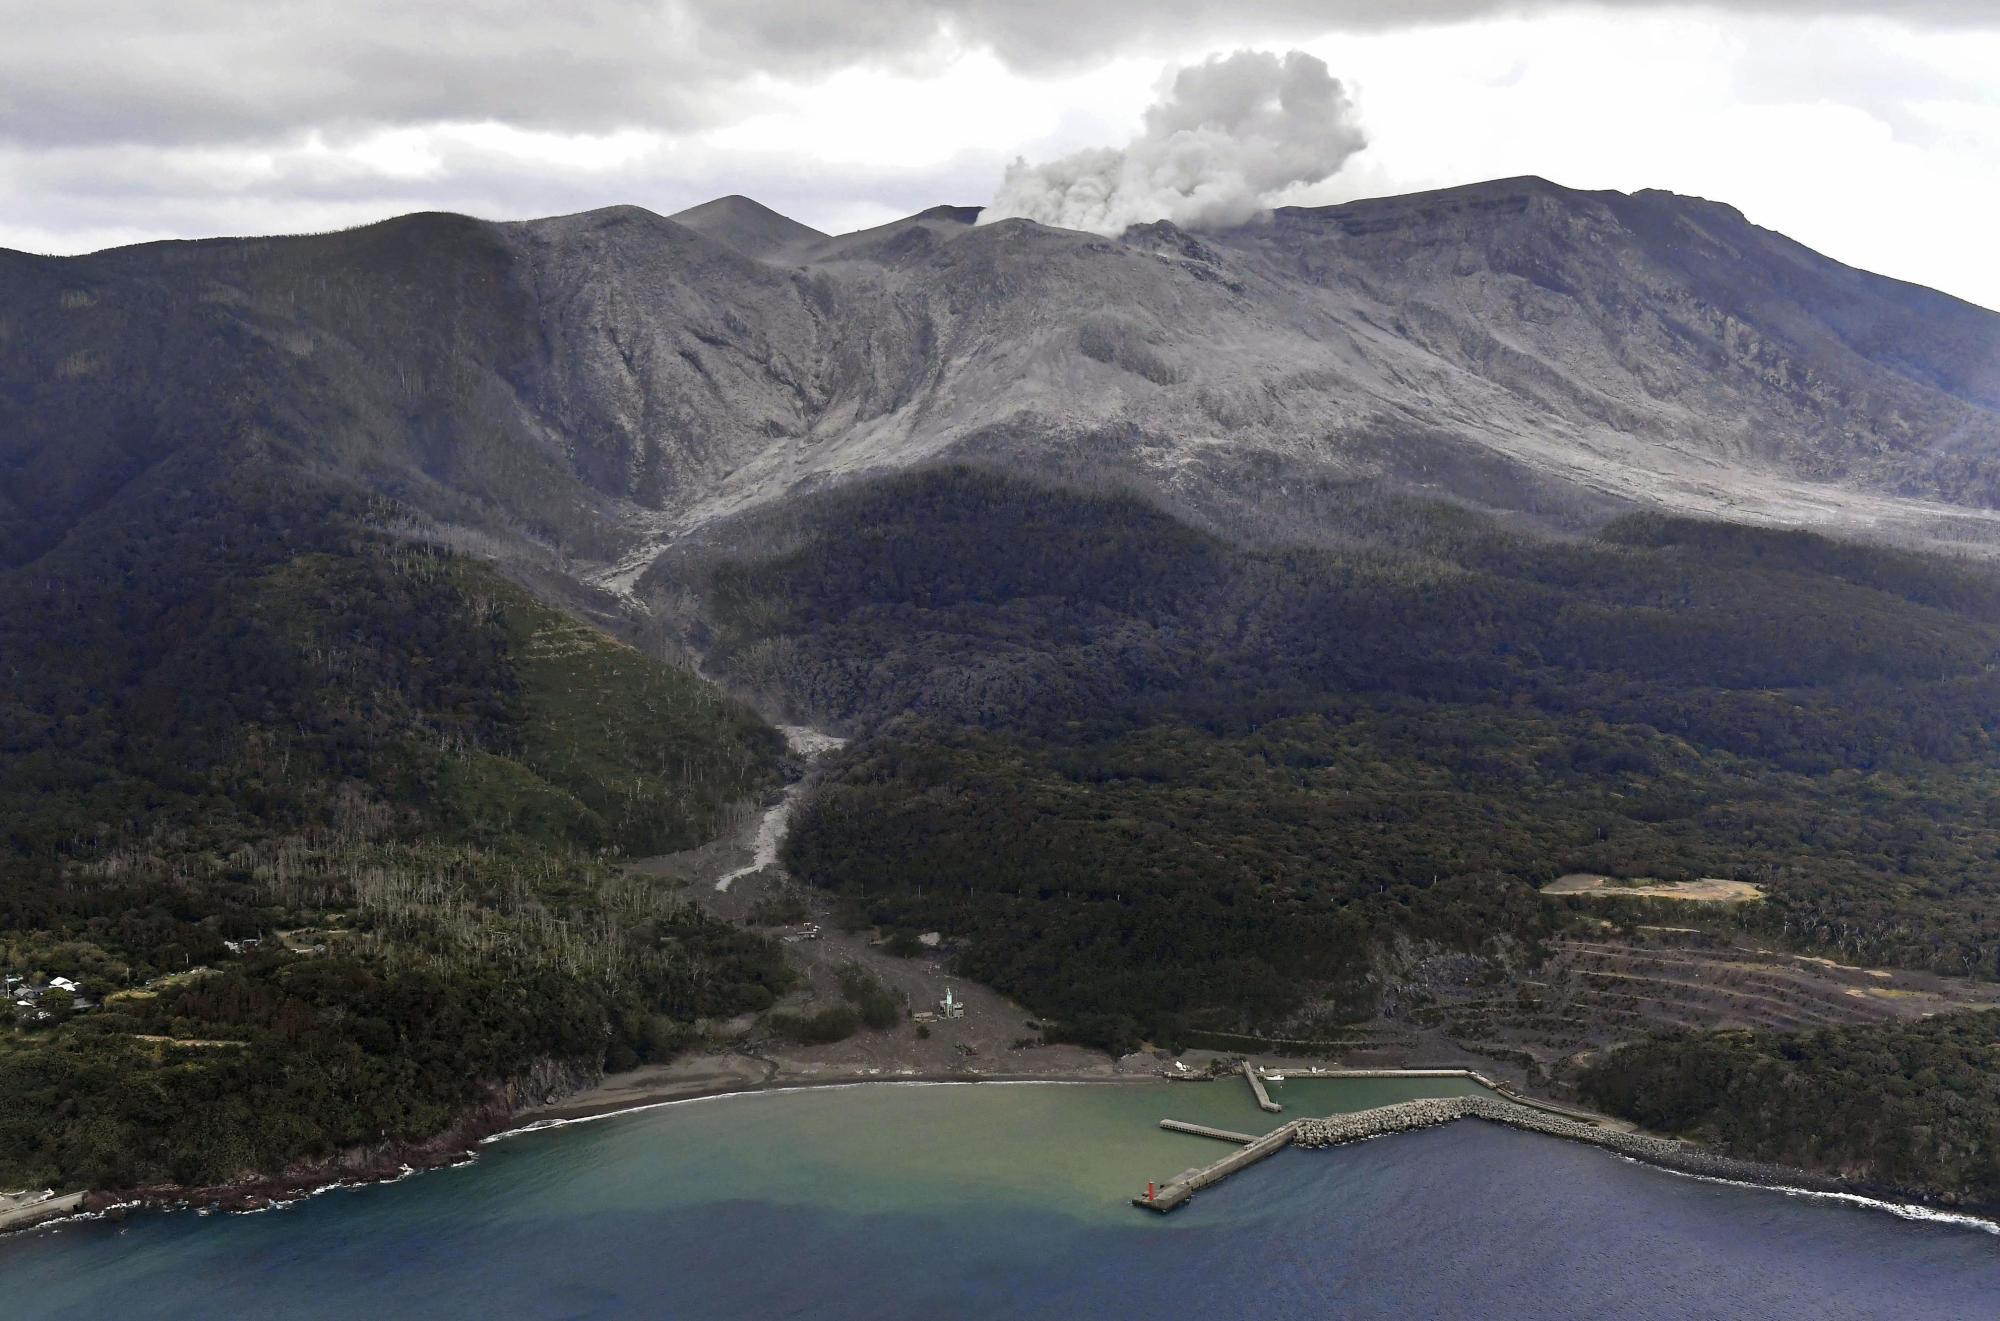 October 29, 2019. EN. Japan : Shindake , La Reunion : Piton de la Fournaise , Peru : Sabancaya , Guatemala : Fuego .